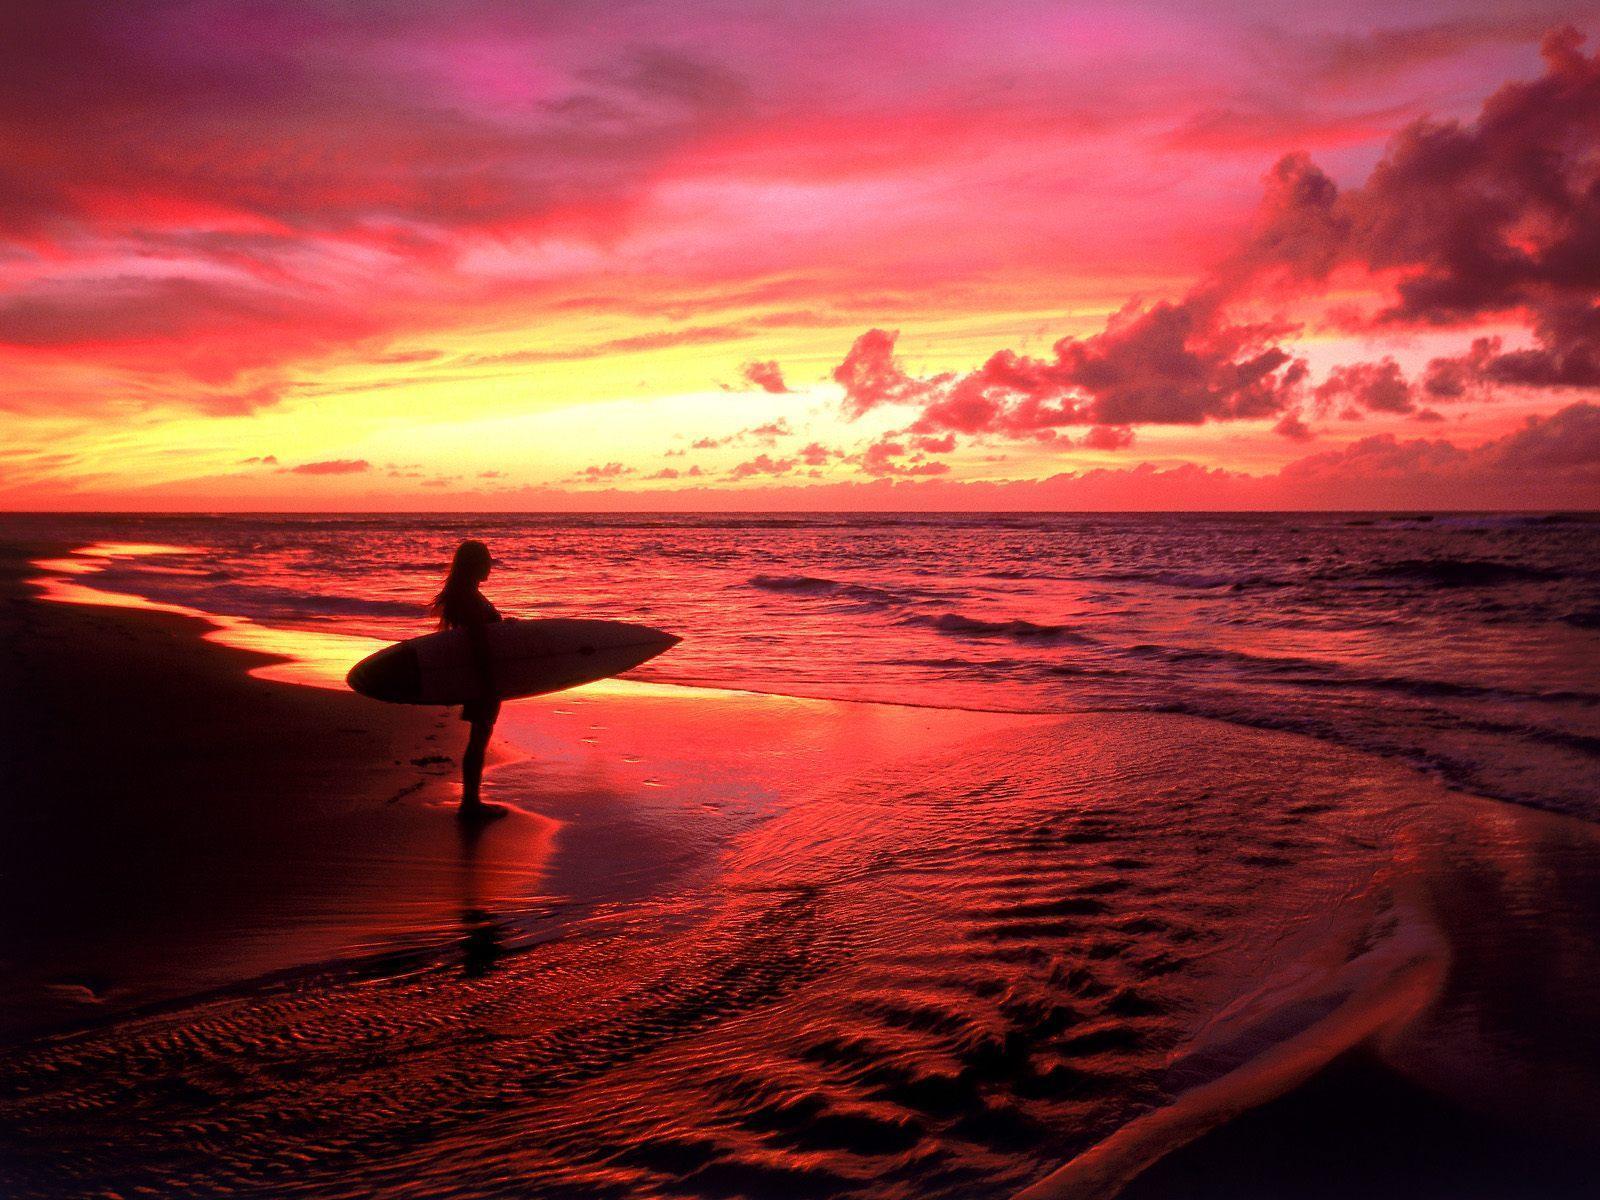 Surfing Desktop Backgrounds 1600x1200